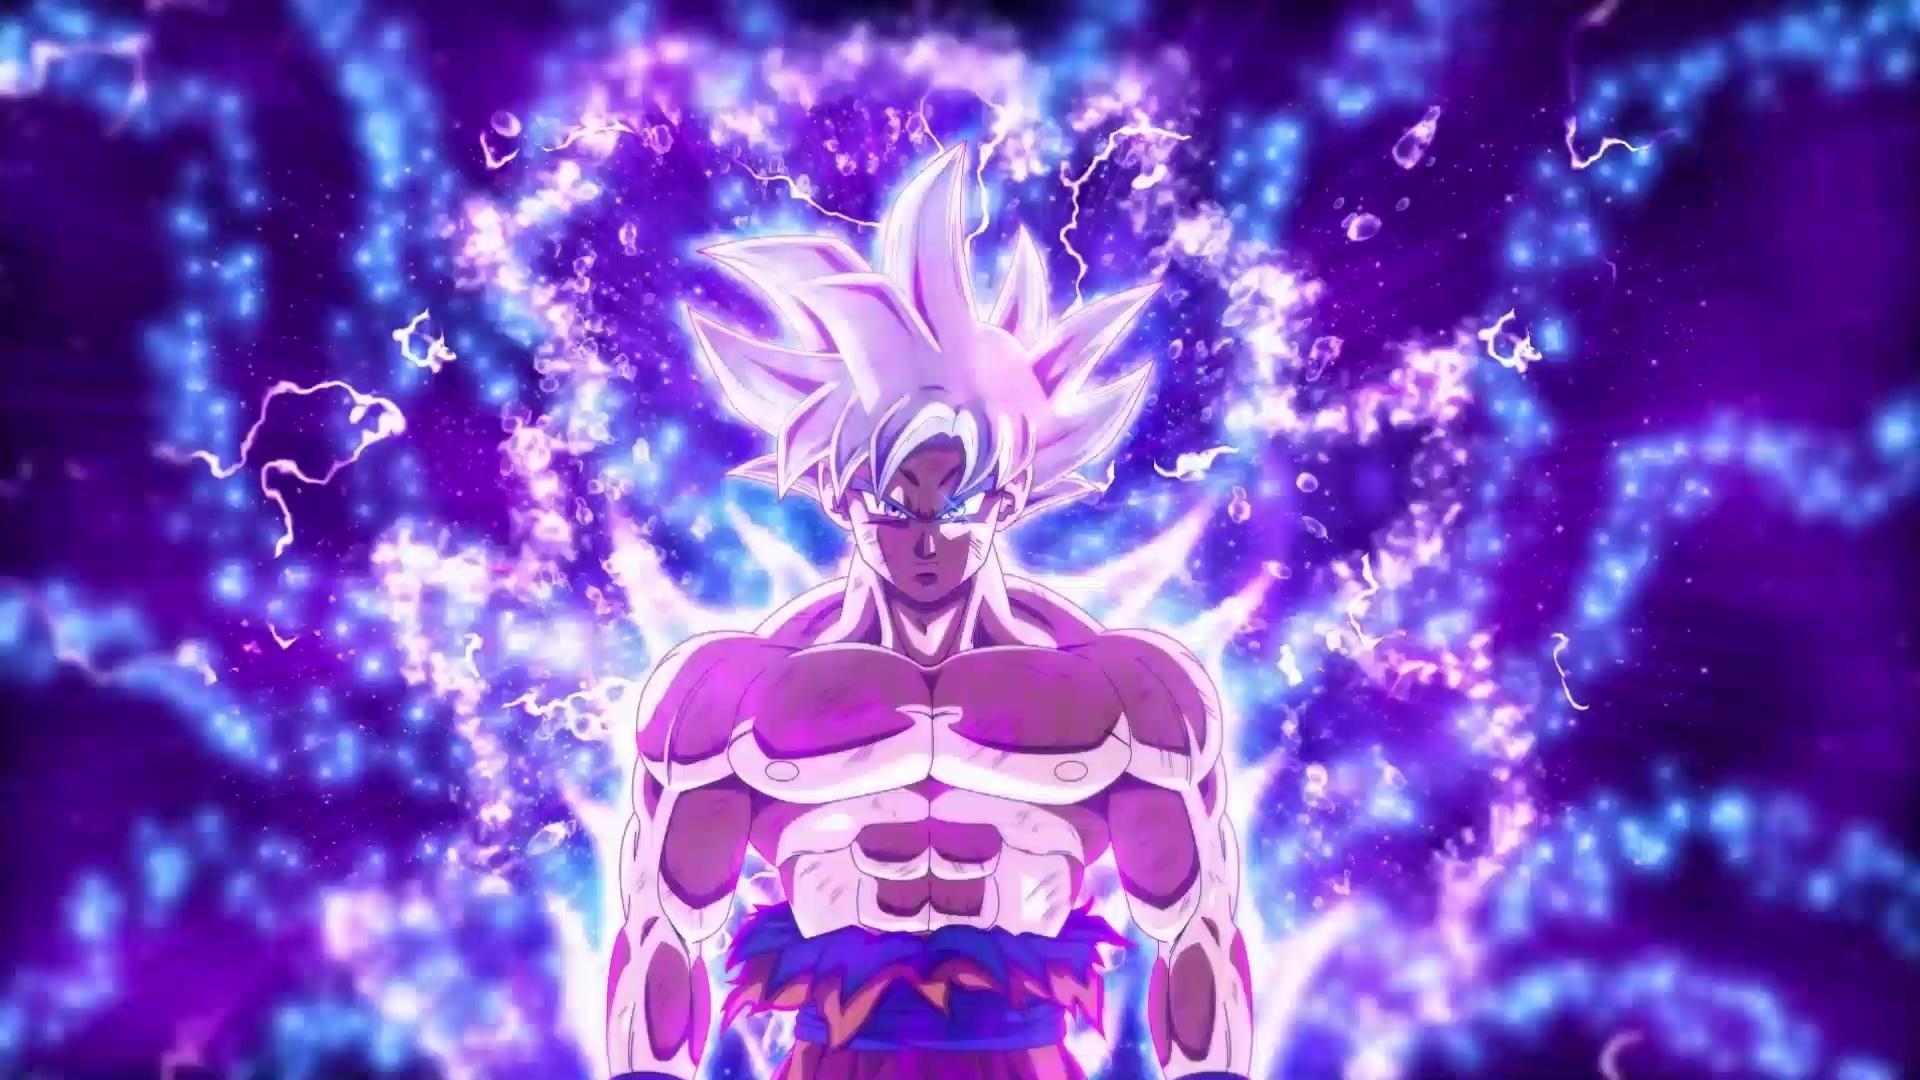 Goku Ultra Instinct desktop wallpaper free download